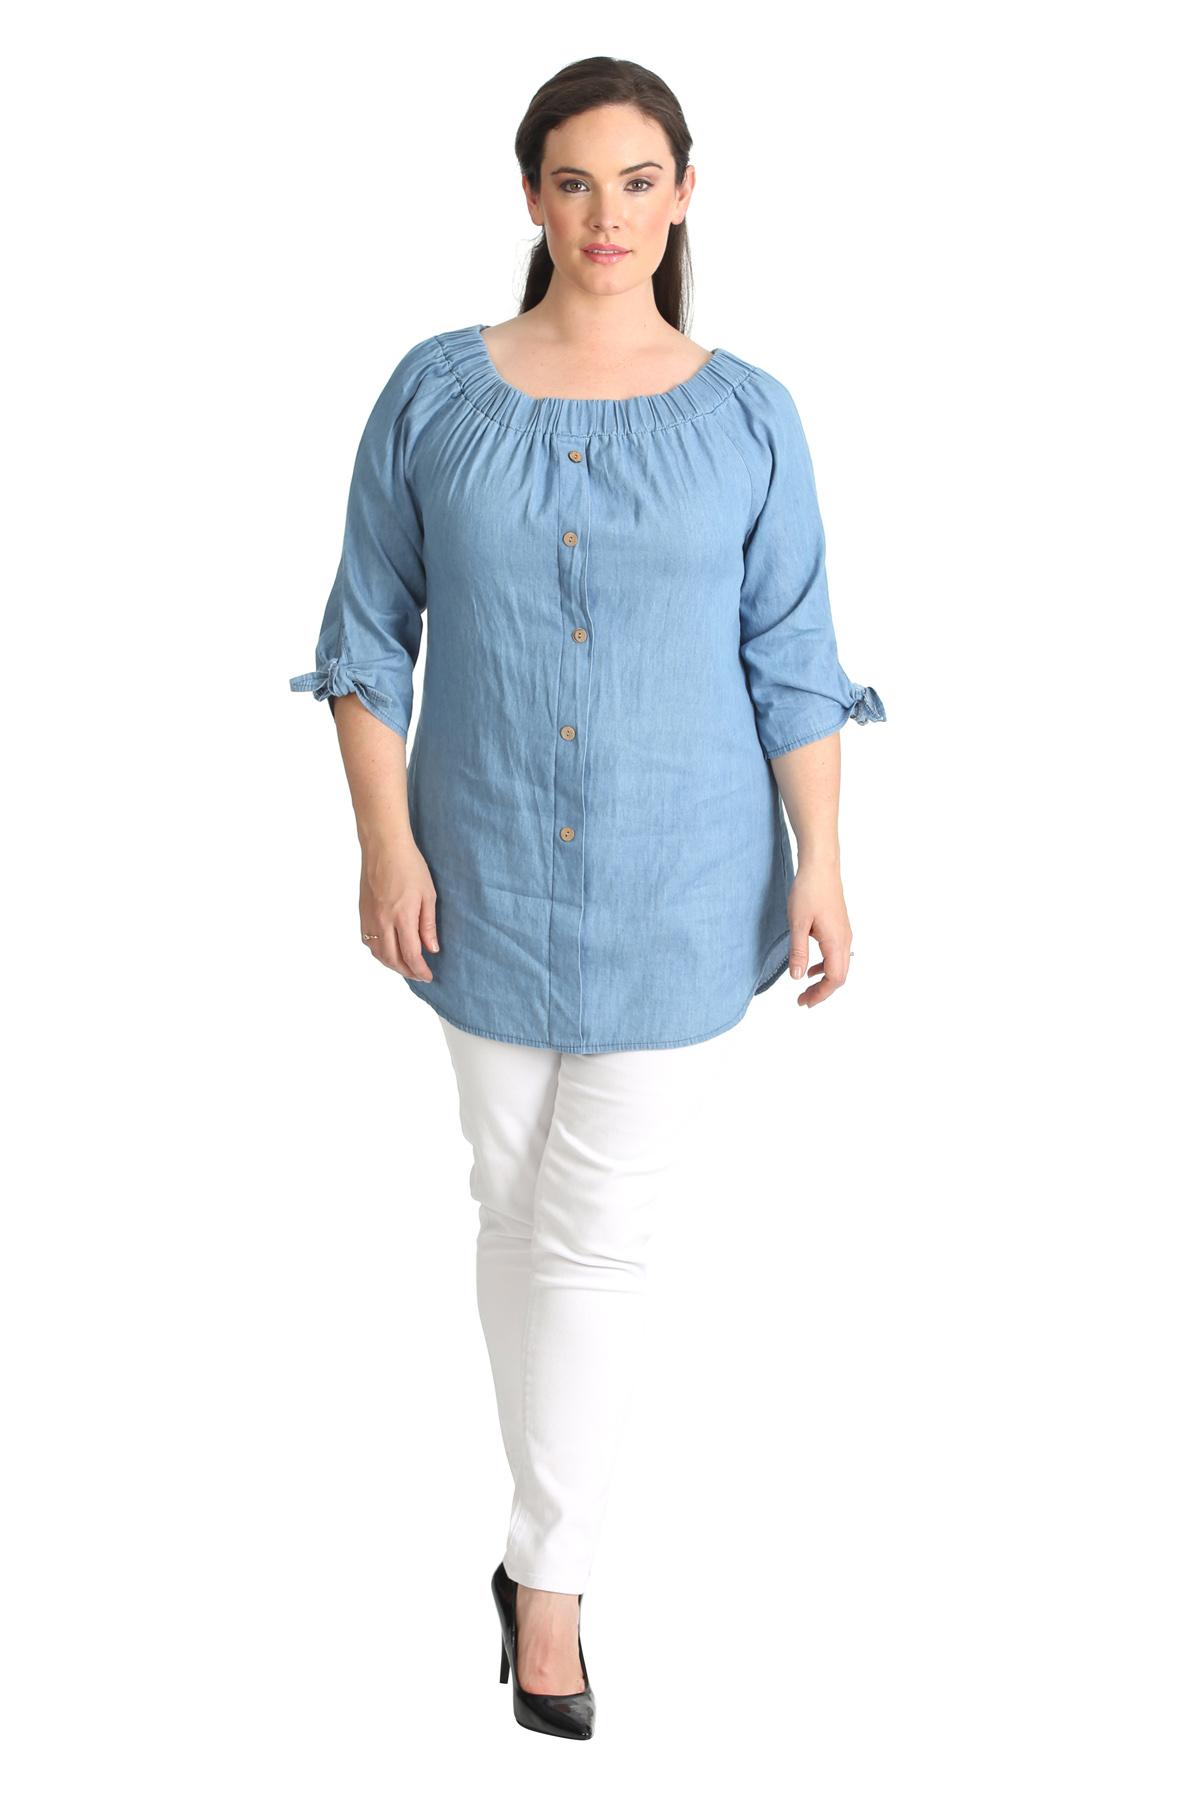 New Womens Shirt Ladies Plus Size Denim Look Top